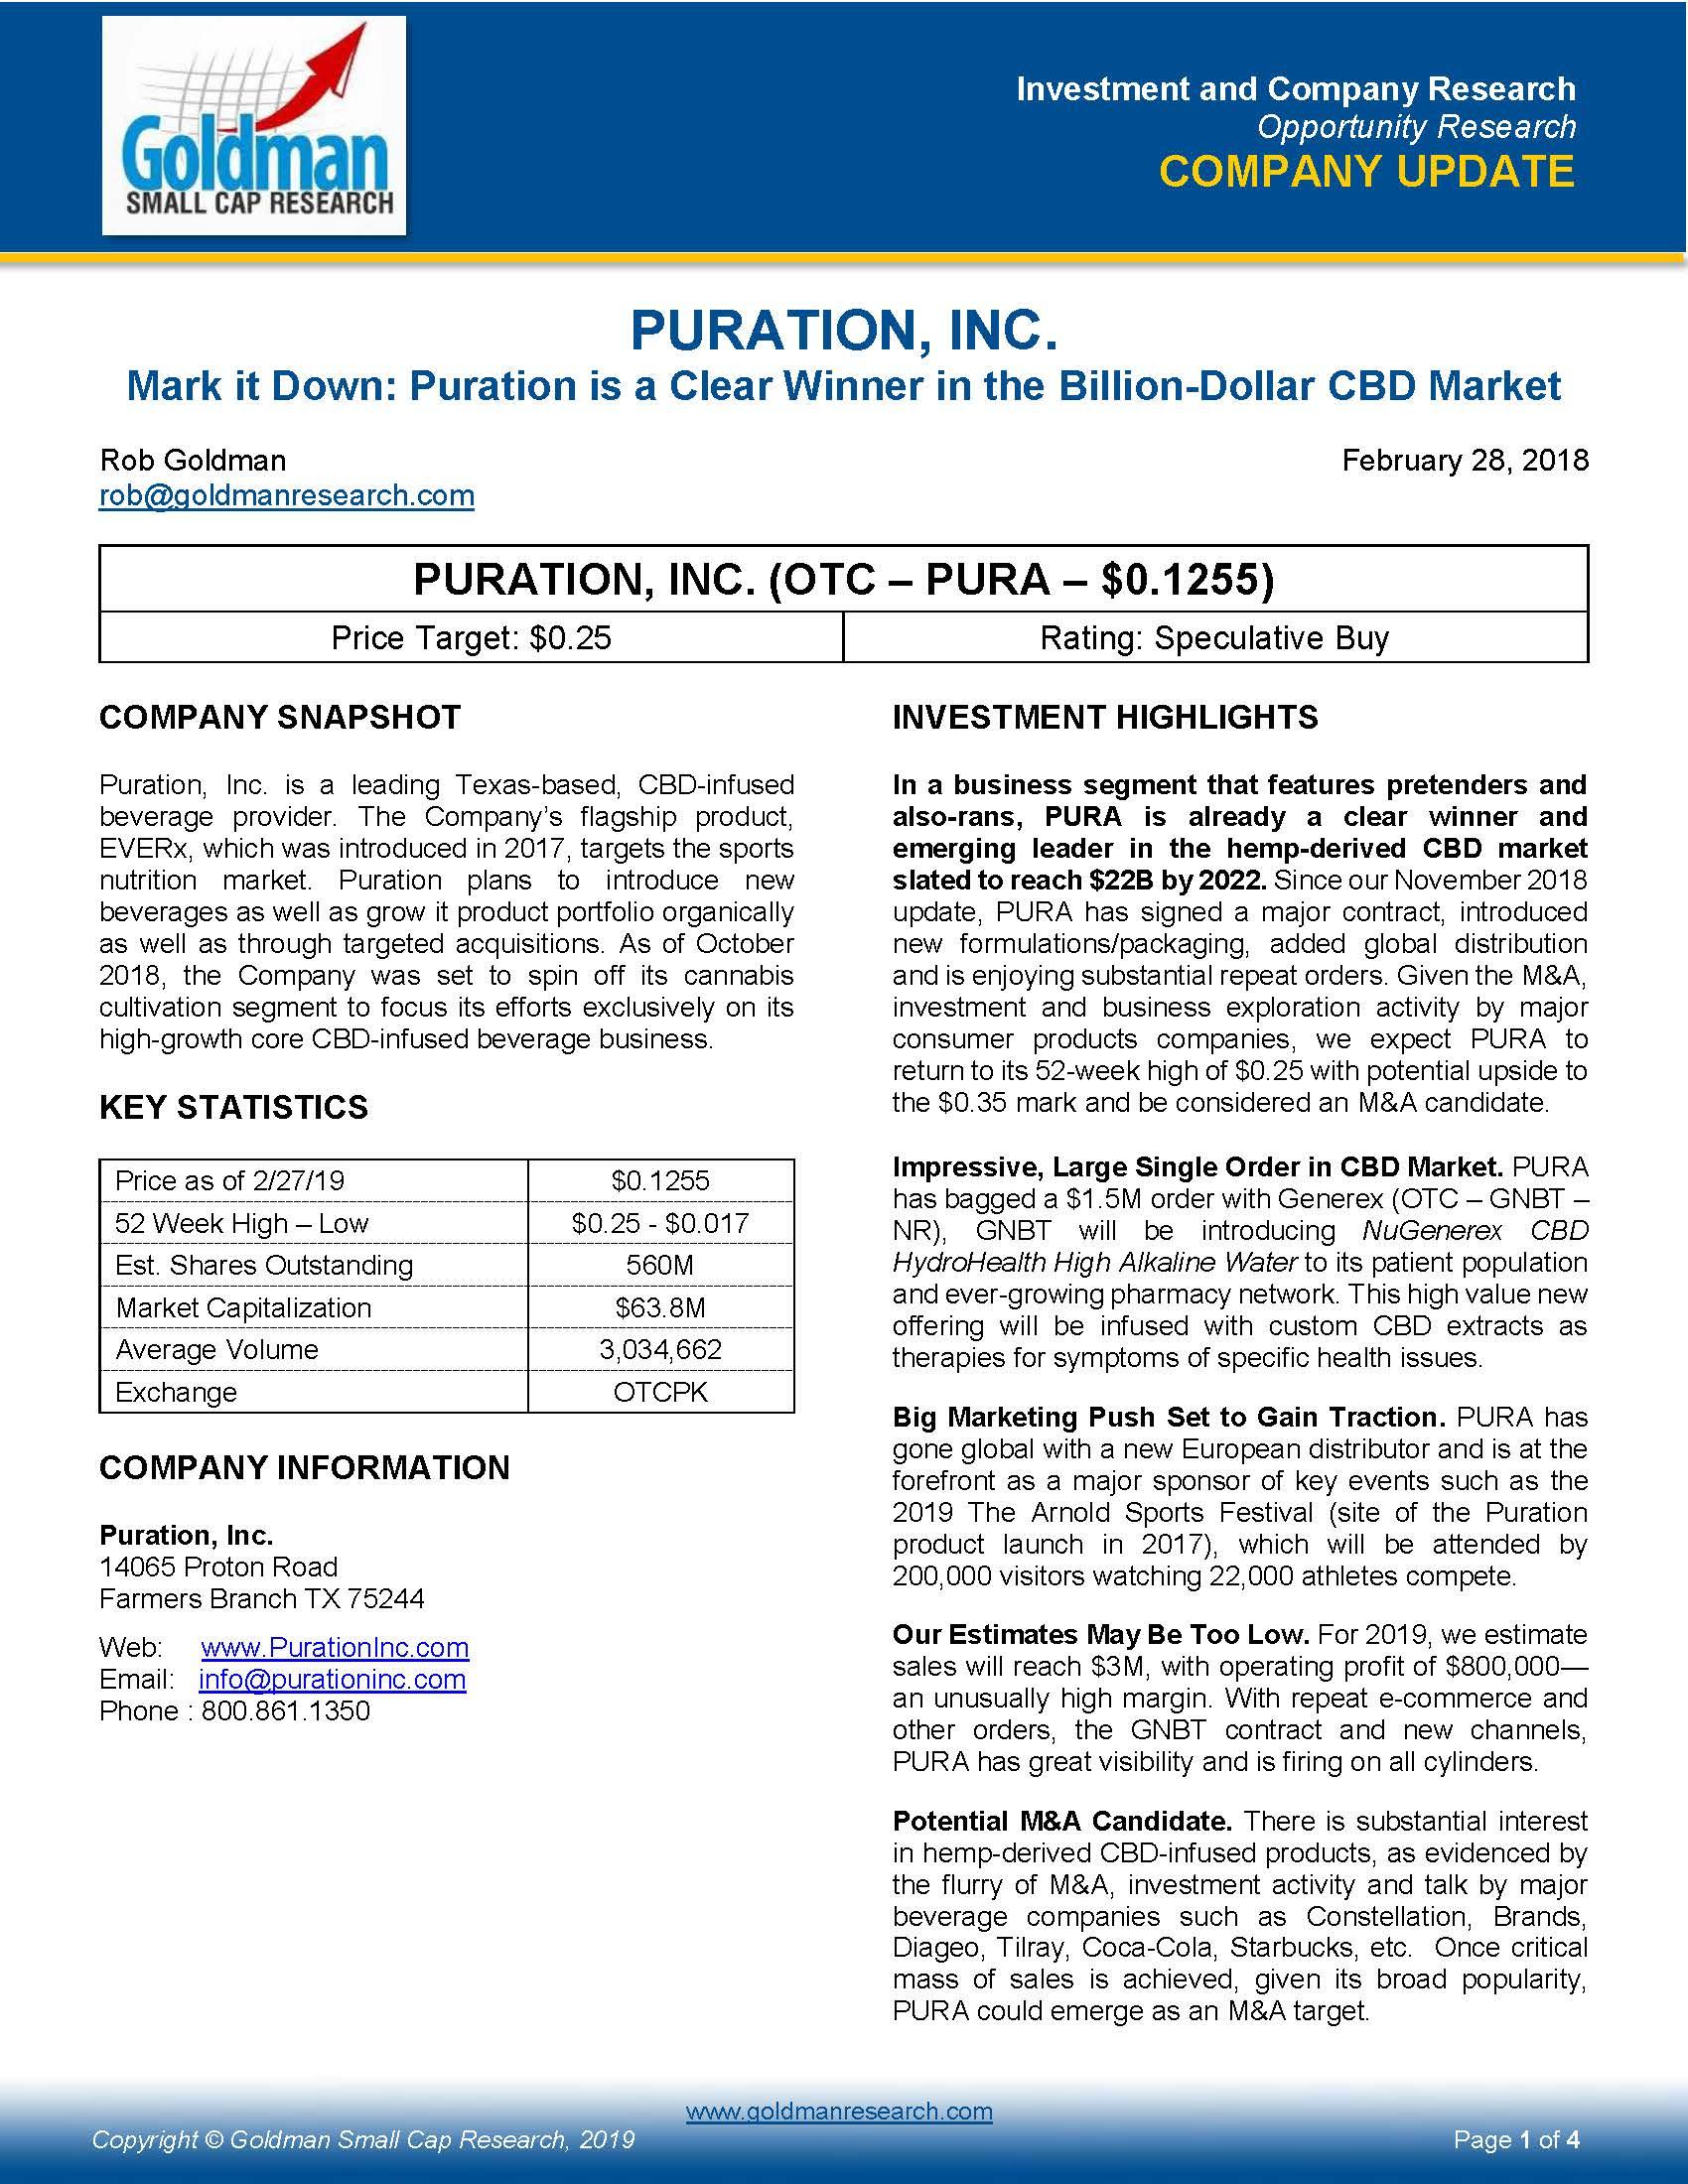 PURA 2.28.19 Final [1]_Page_1.jpg